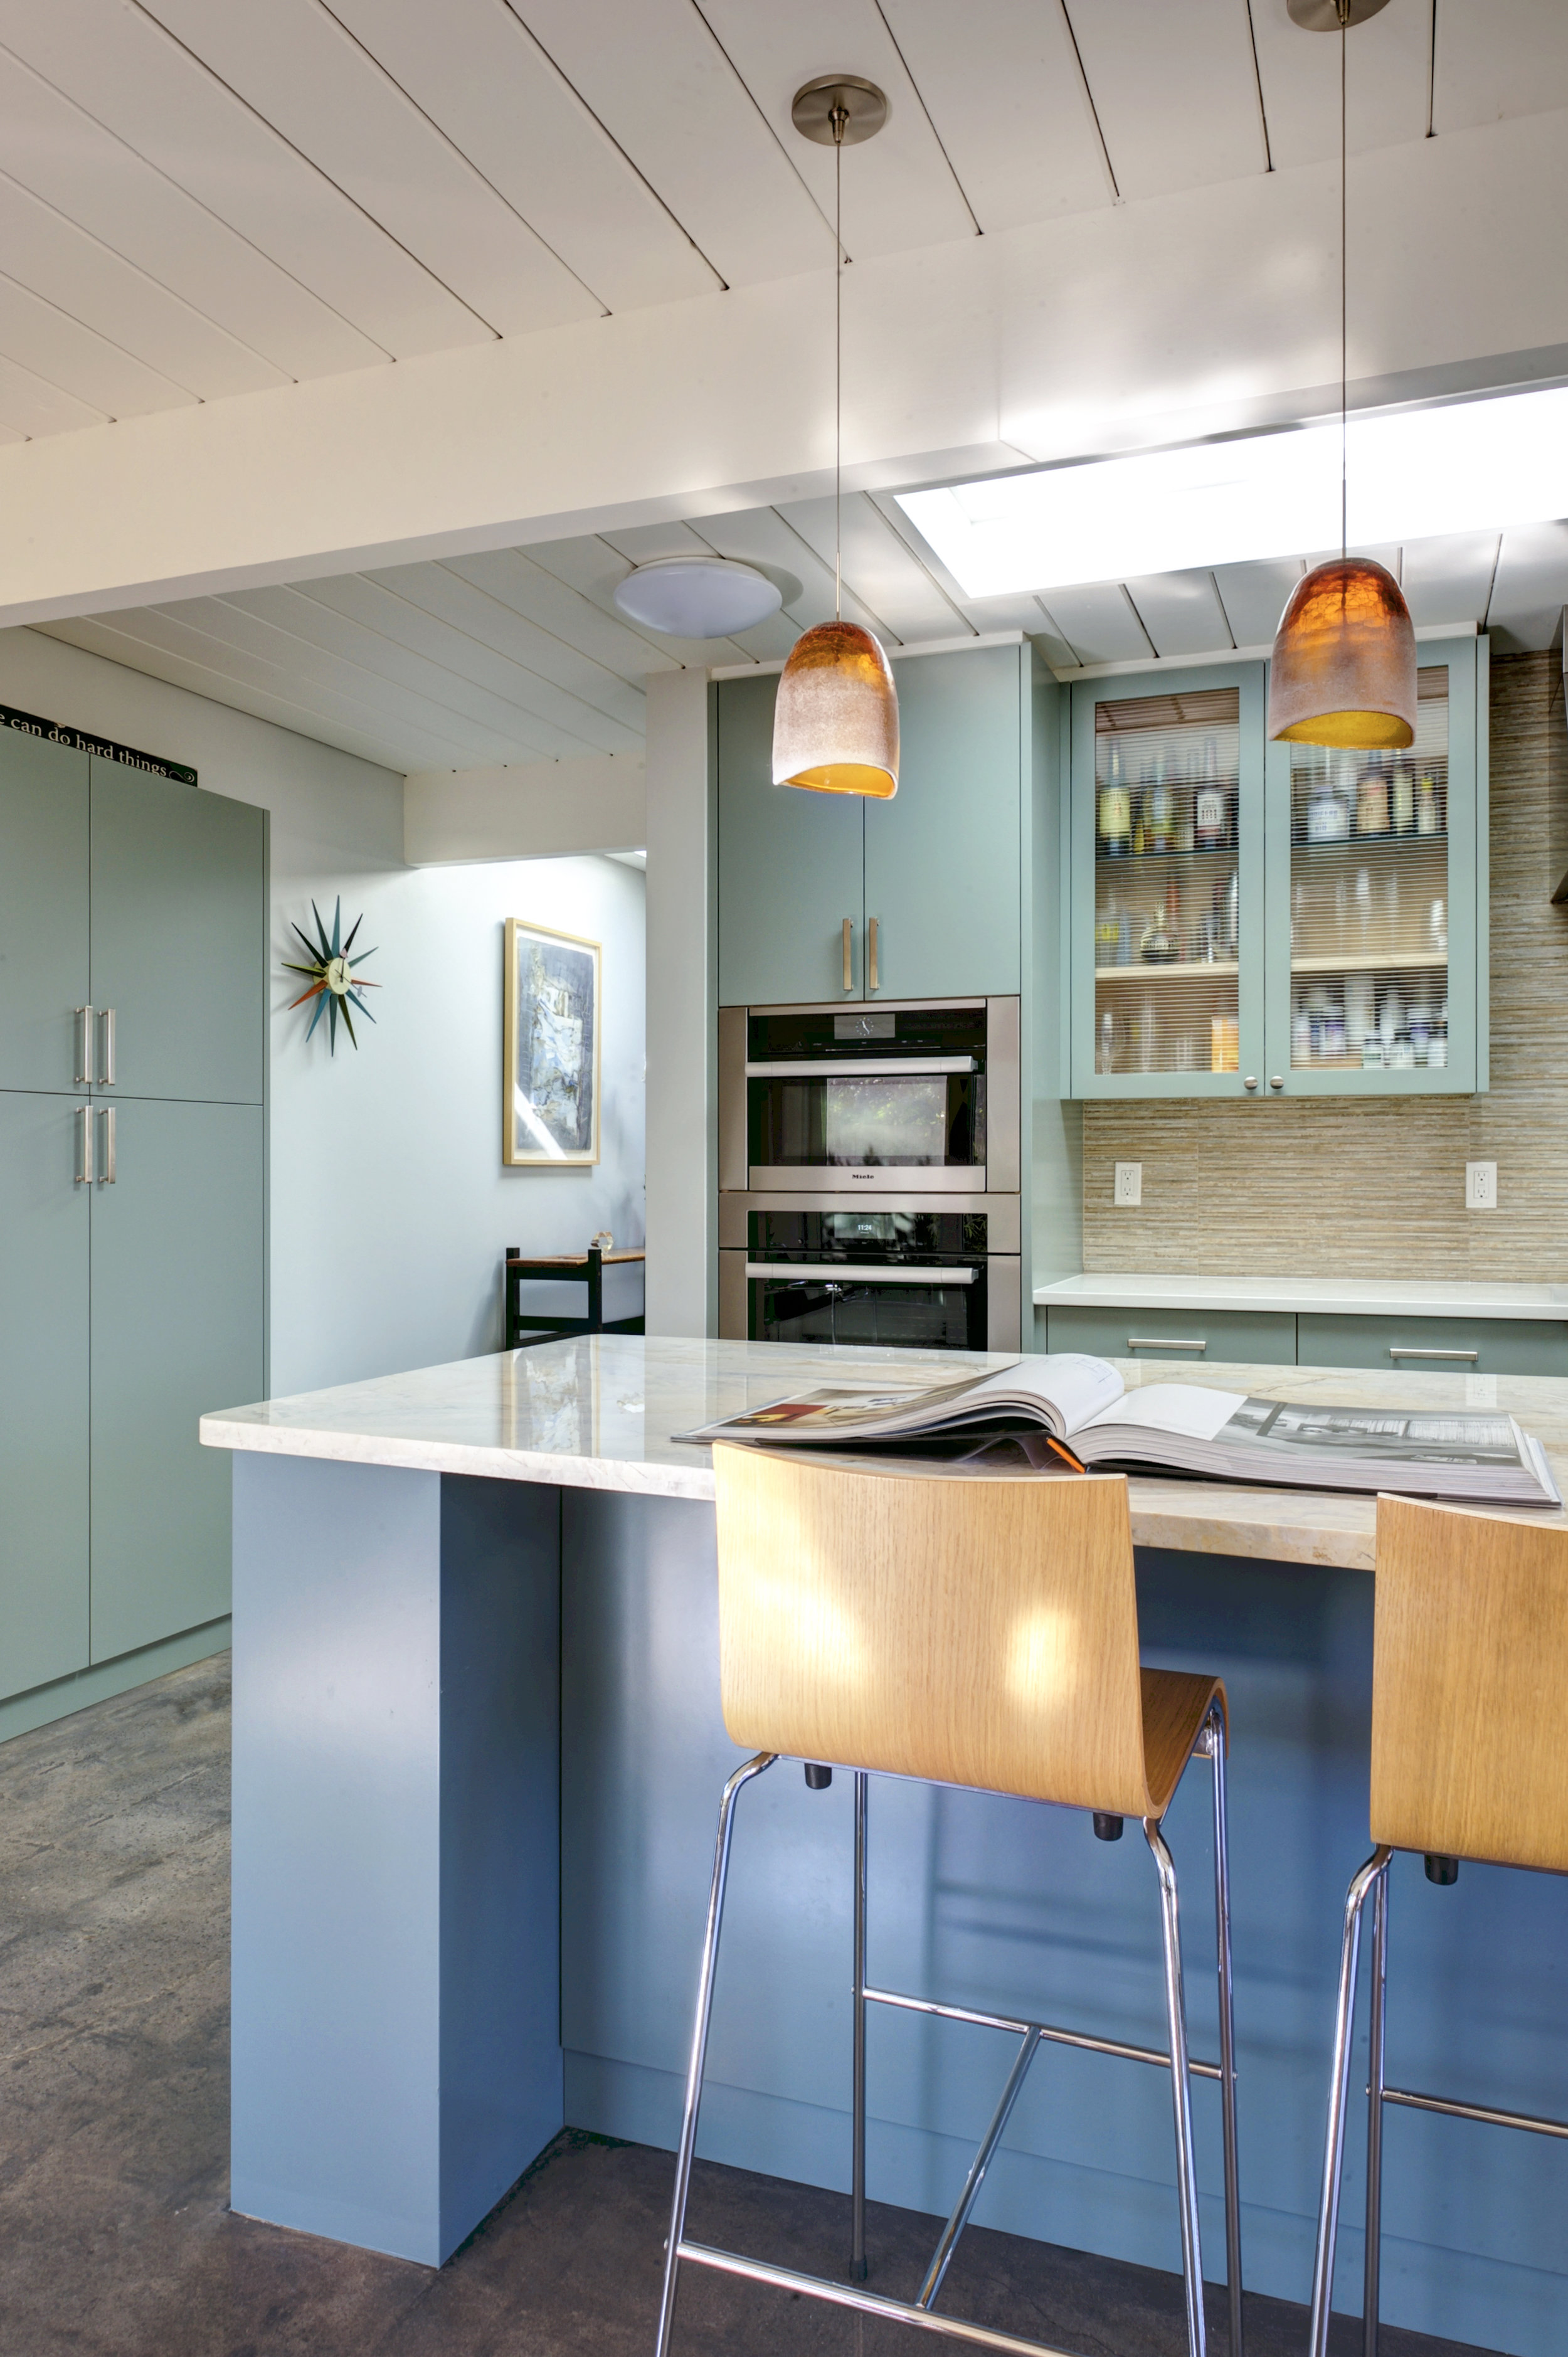 San Mateo Eichler - complete home remodel